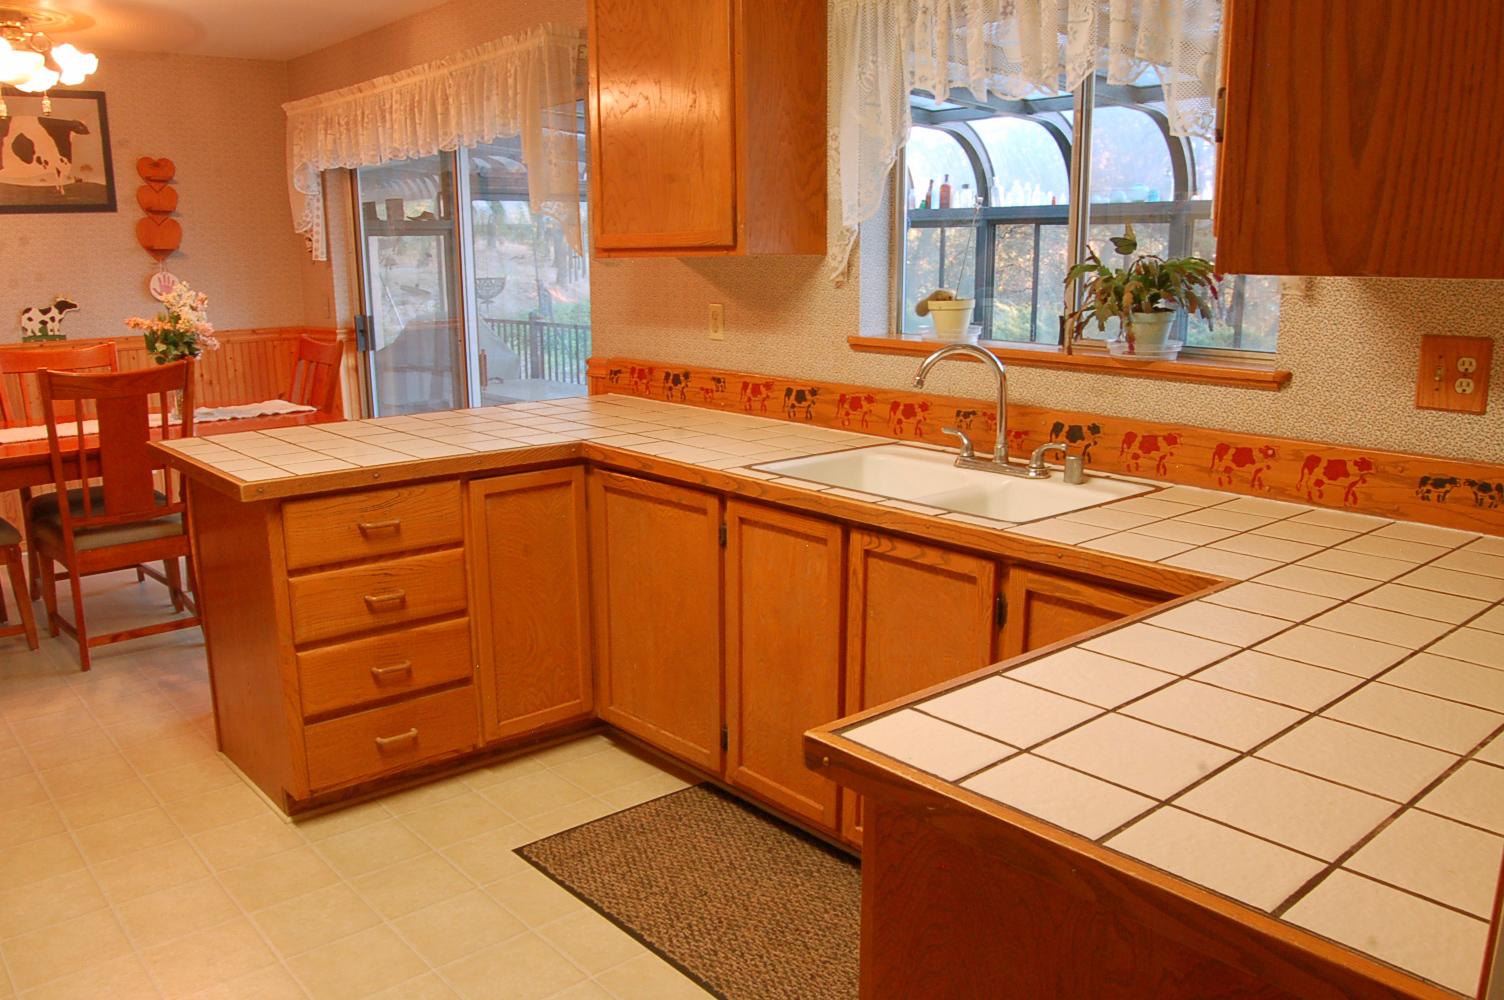 17410-Hooker-Creek-Rd-Cottonwood-CA-kitchen2